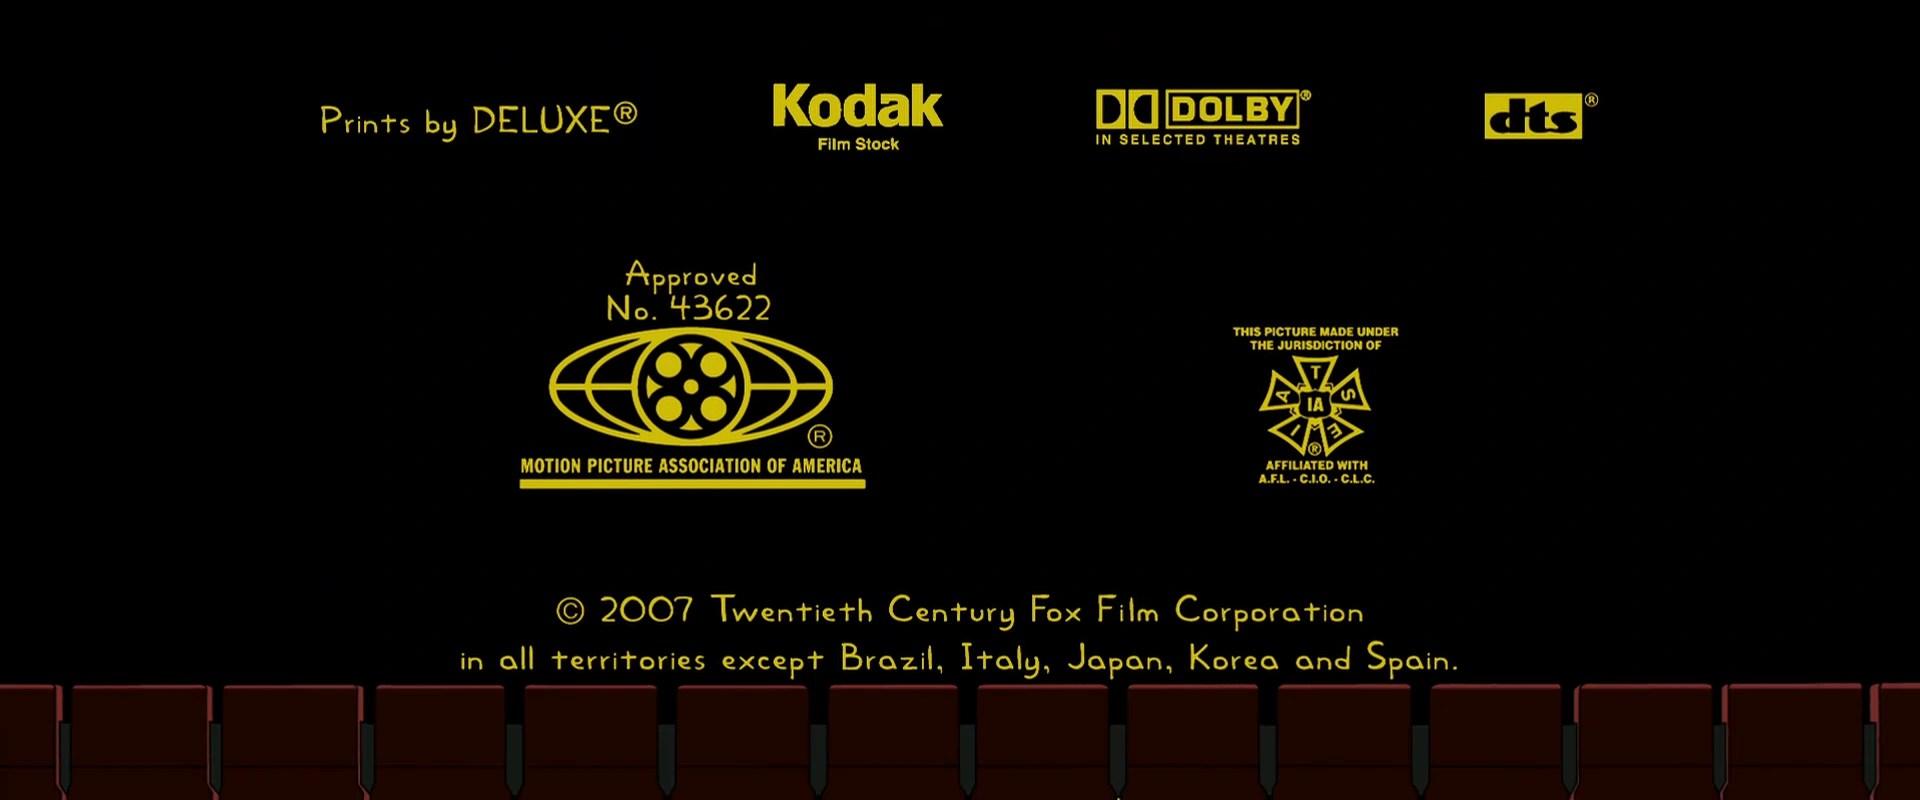 Mpaa Iatse Kodak Dolby Sdds Dts 22100 TIMEHD